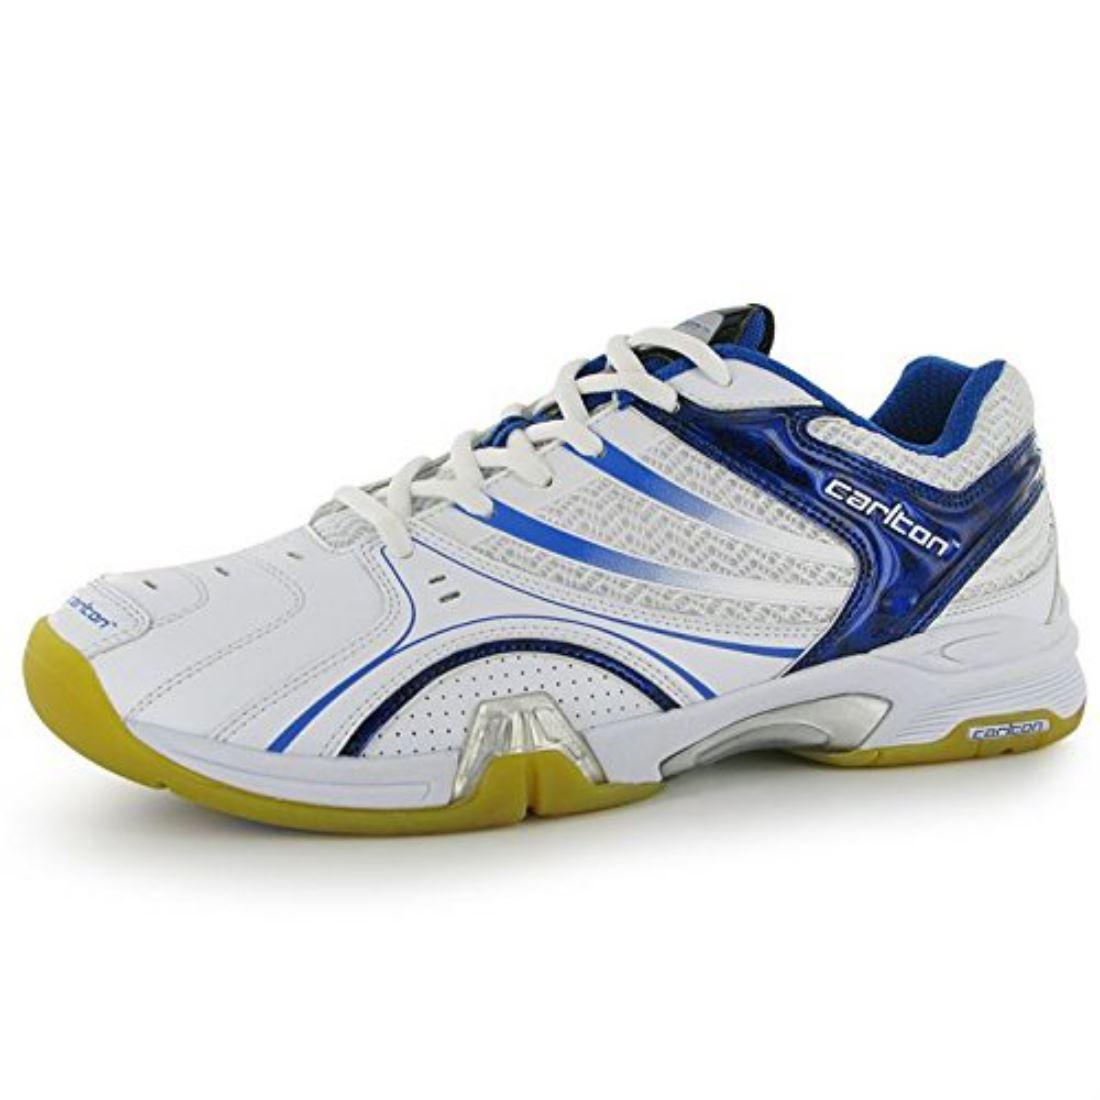 carlton mens airblade badminton sports shoes trainers ebay